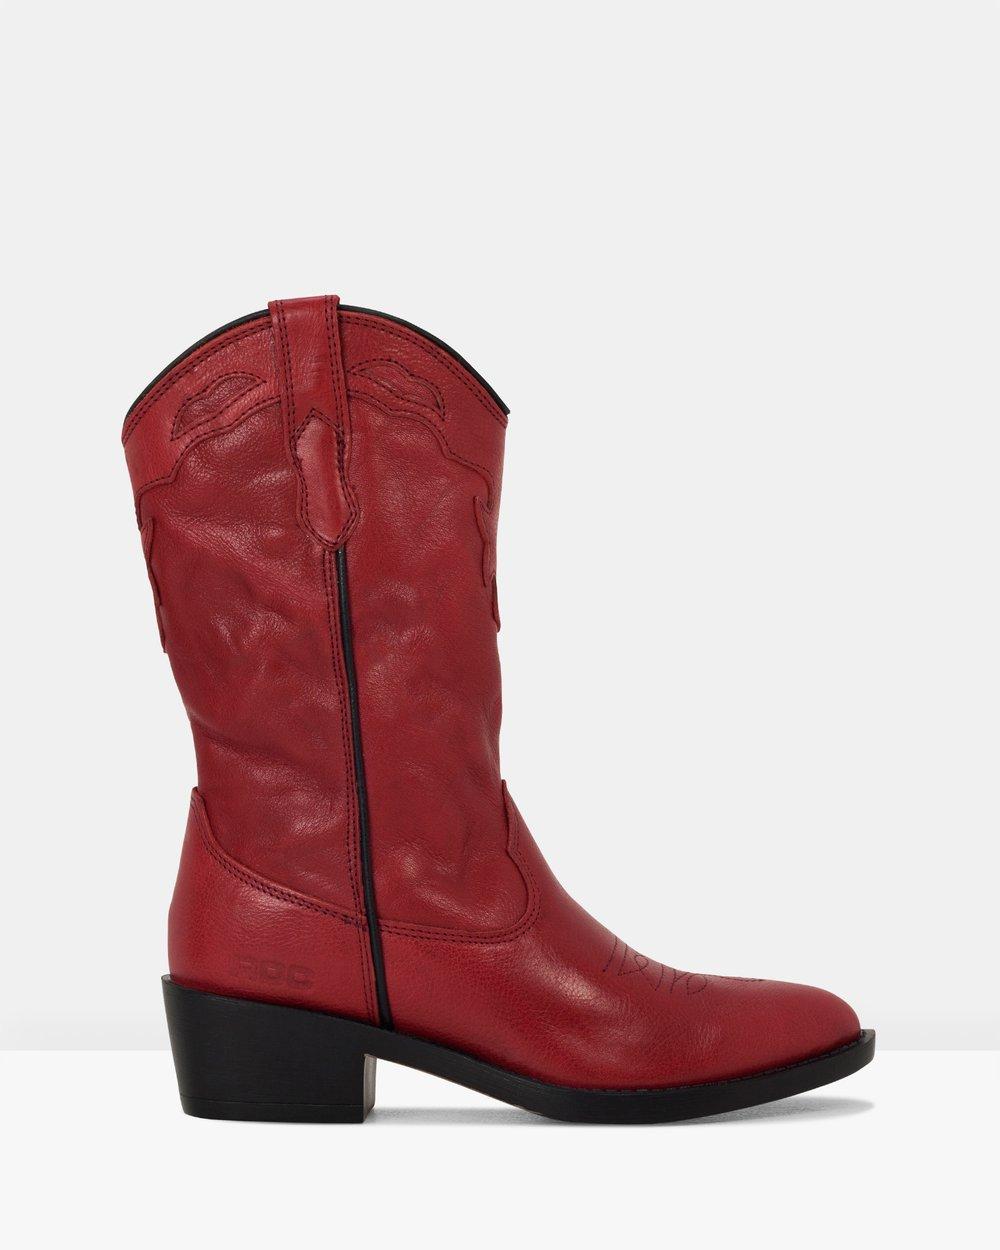 f763b4a58de Indio by ROC Boots Australia Online | THE ICONIC | Australia